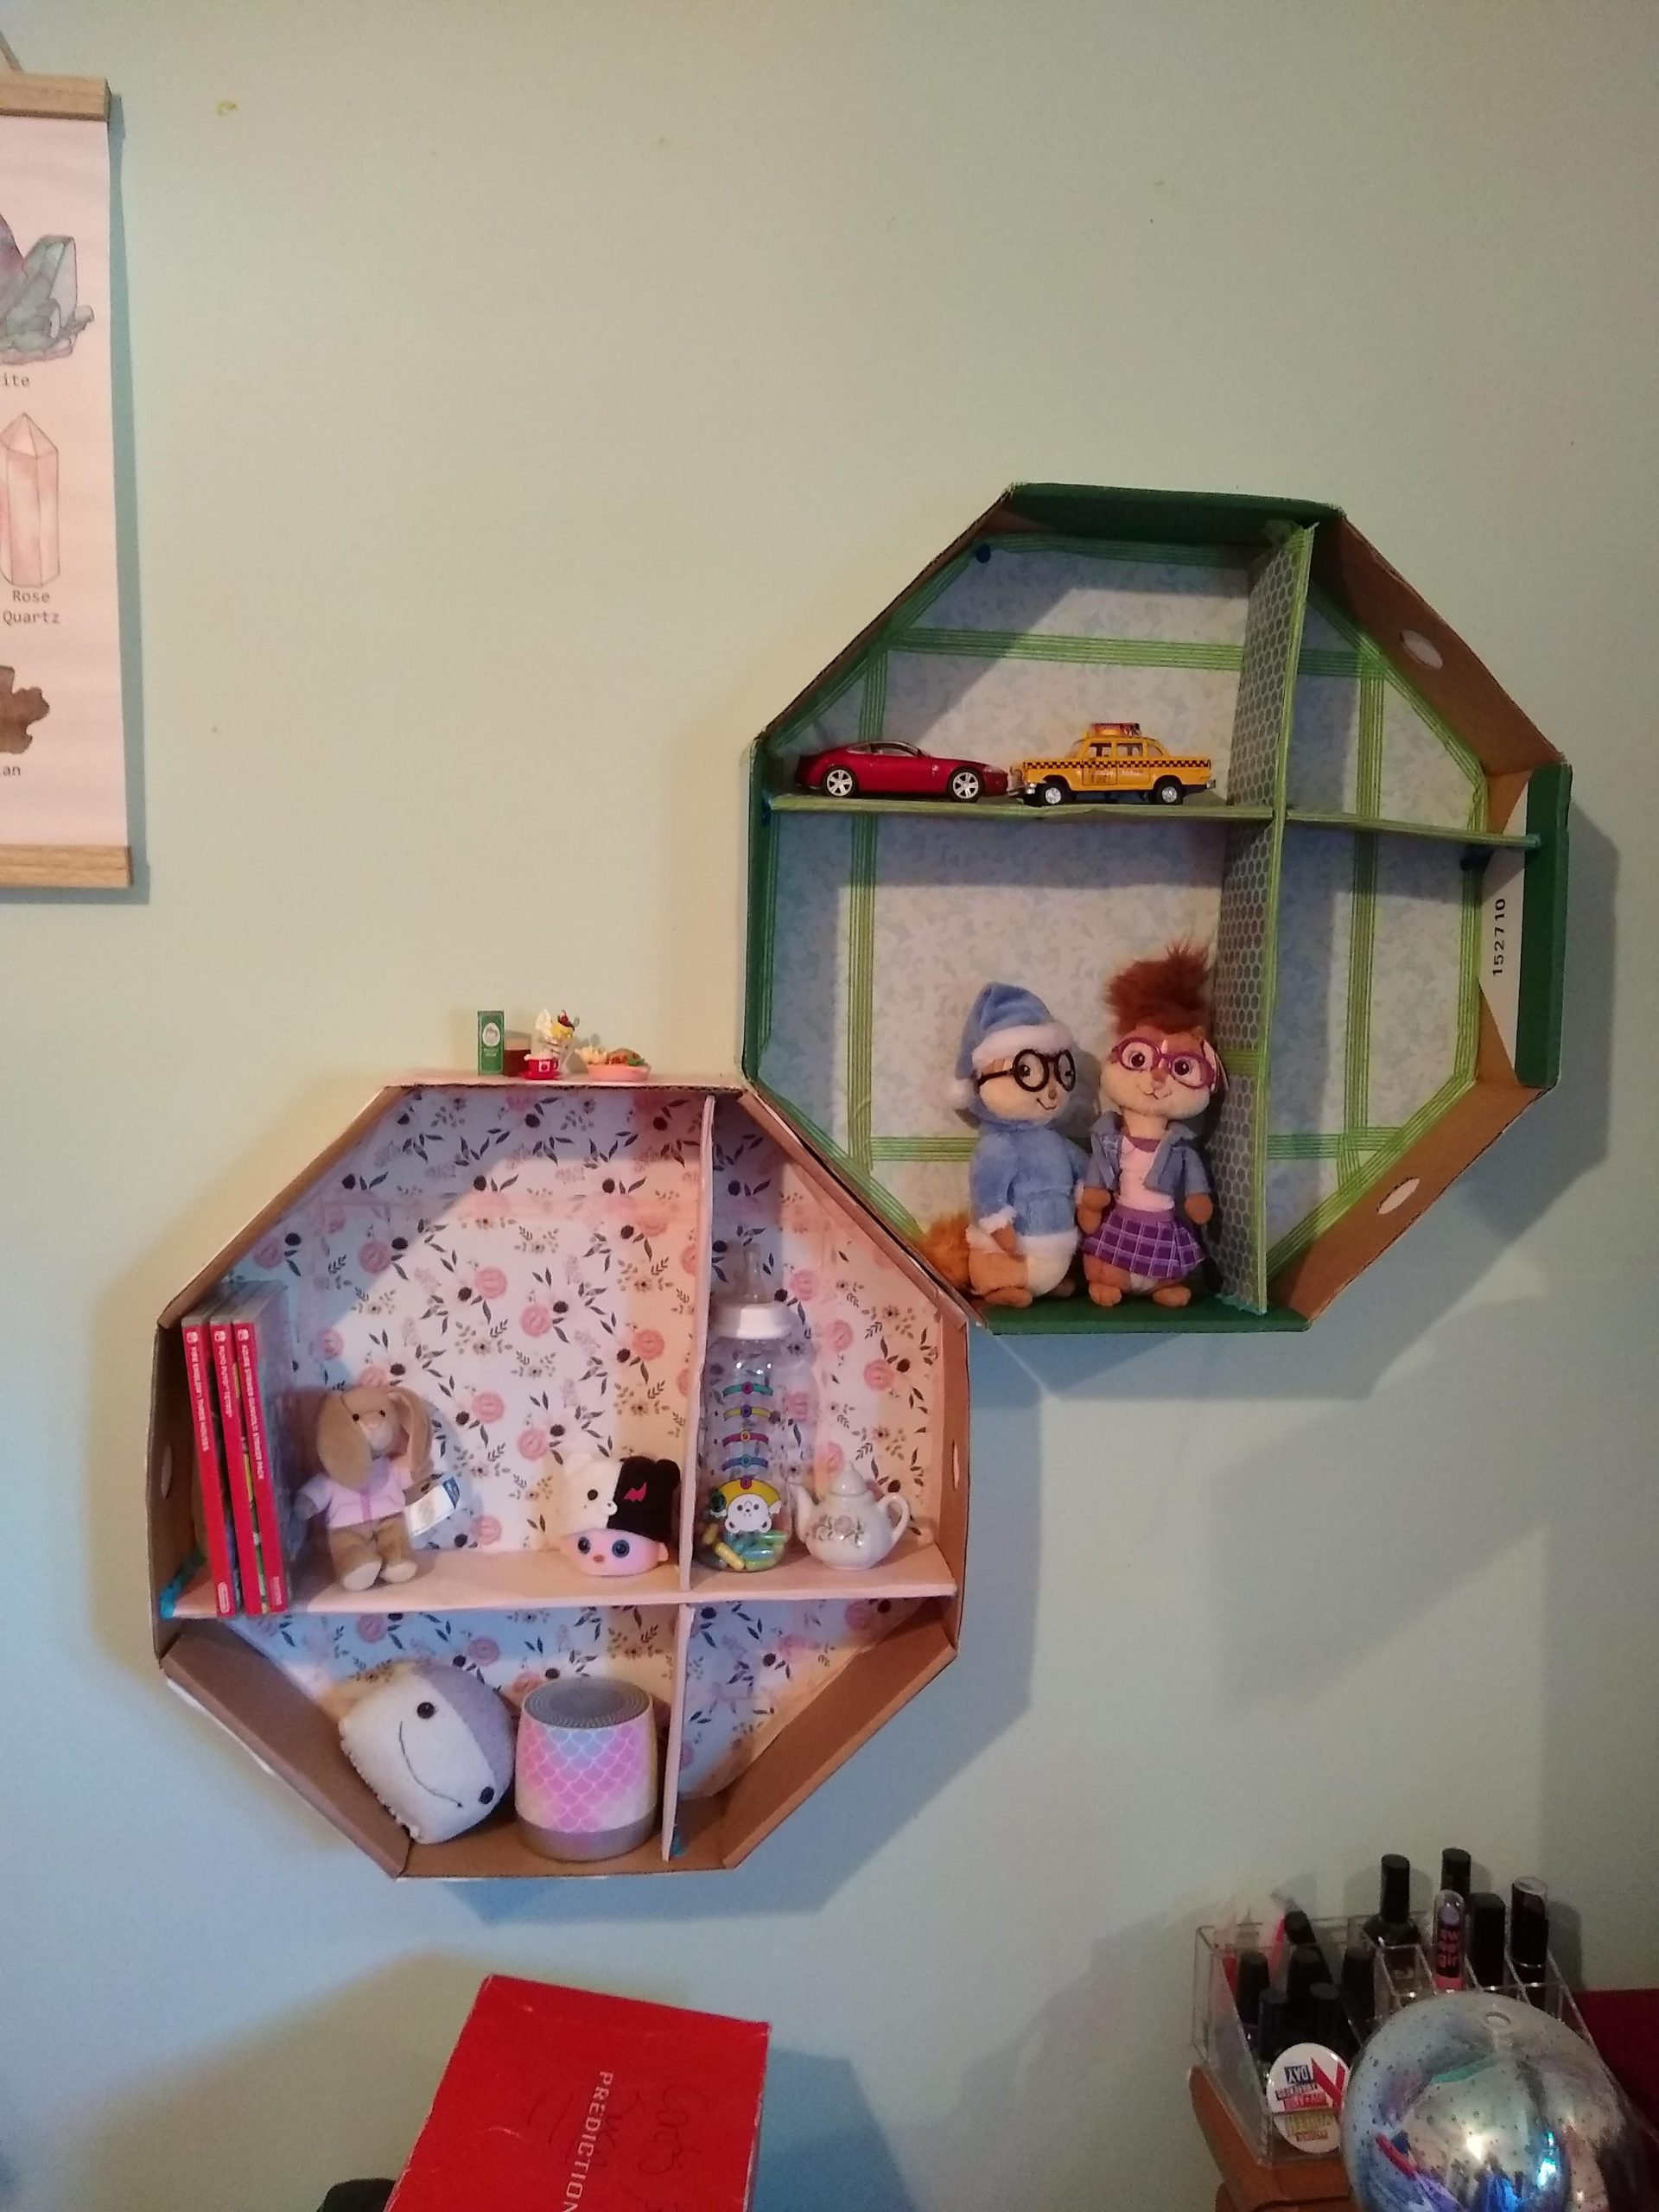 1p7wgfe5u7151 scaled - Hello! I made shelves from a present box - hobbies, crafts